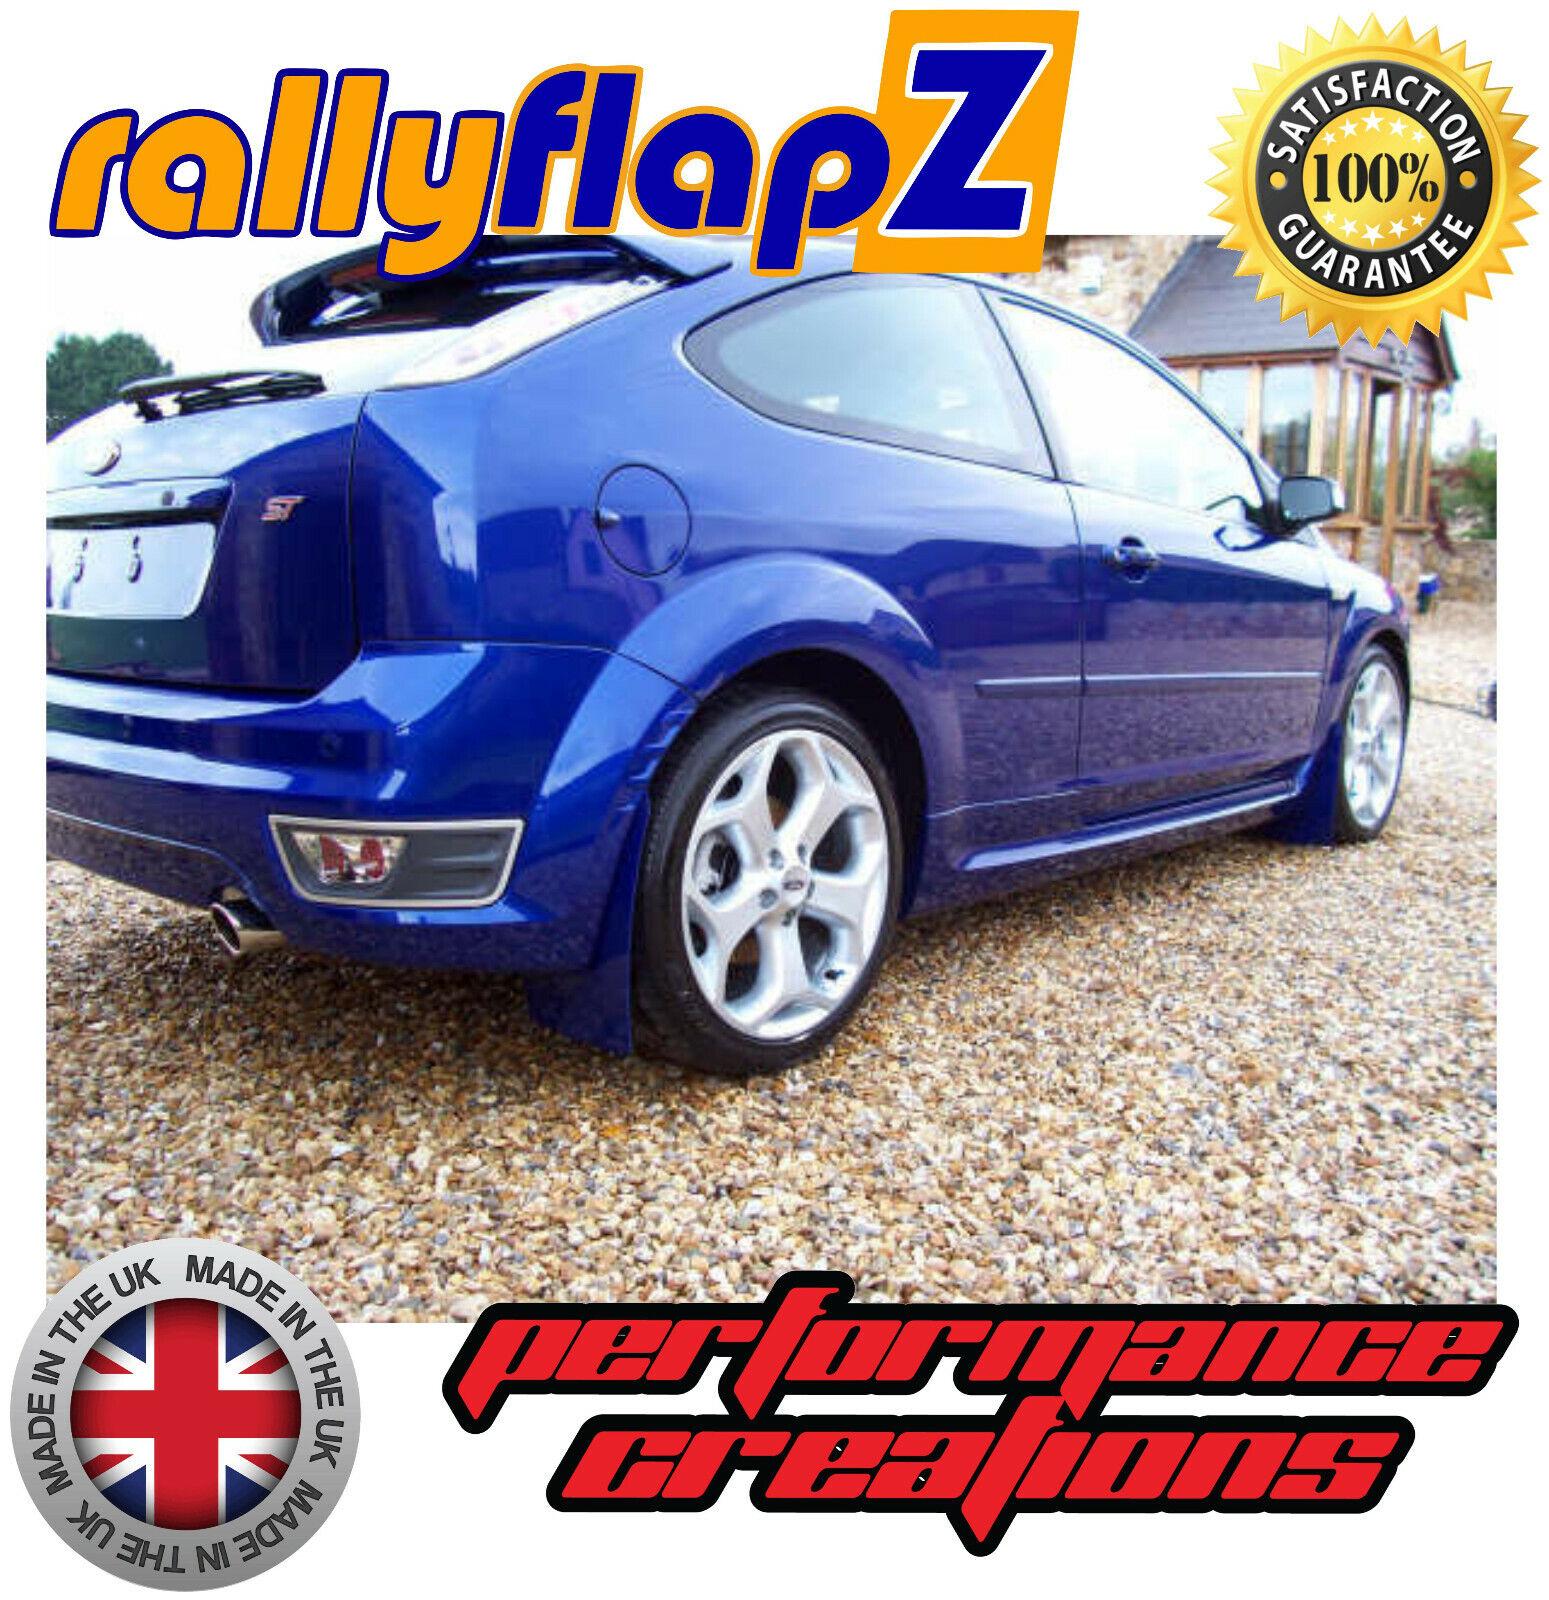 FORD FOCUS MK2 ST225 04-11 Mudflaps BLUE 4mm Thick PVC MSA Rally Spec Mud Flaps